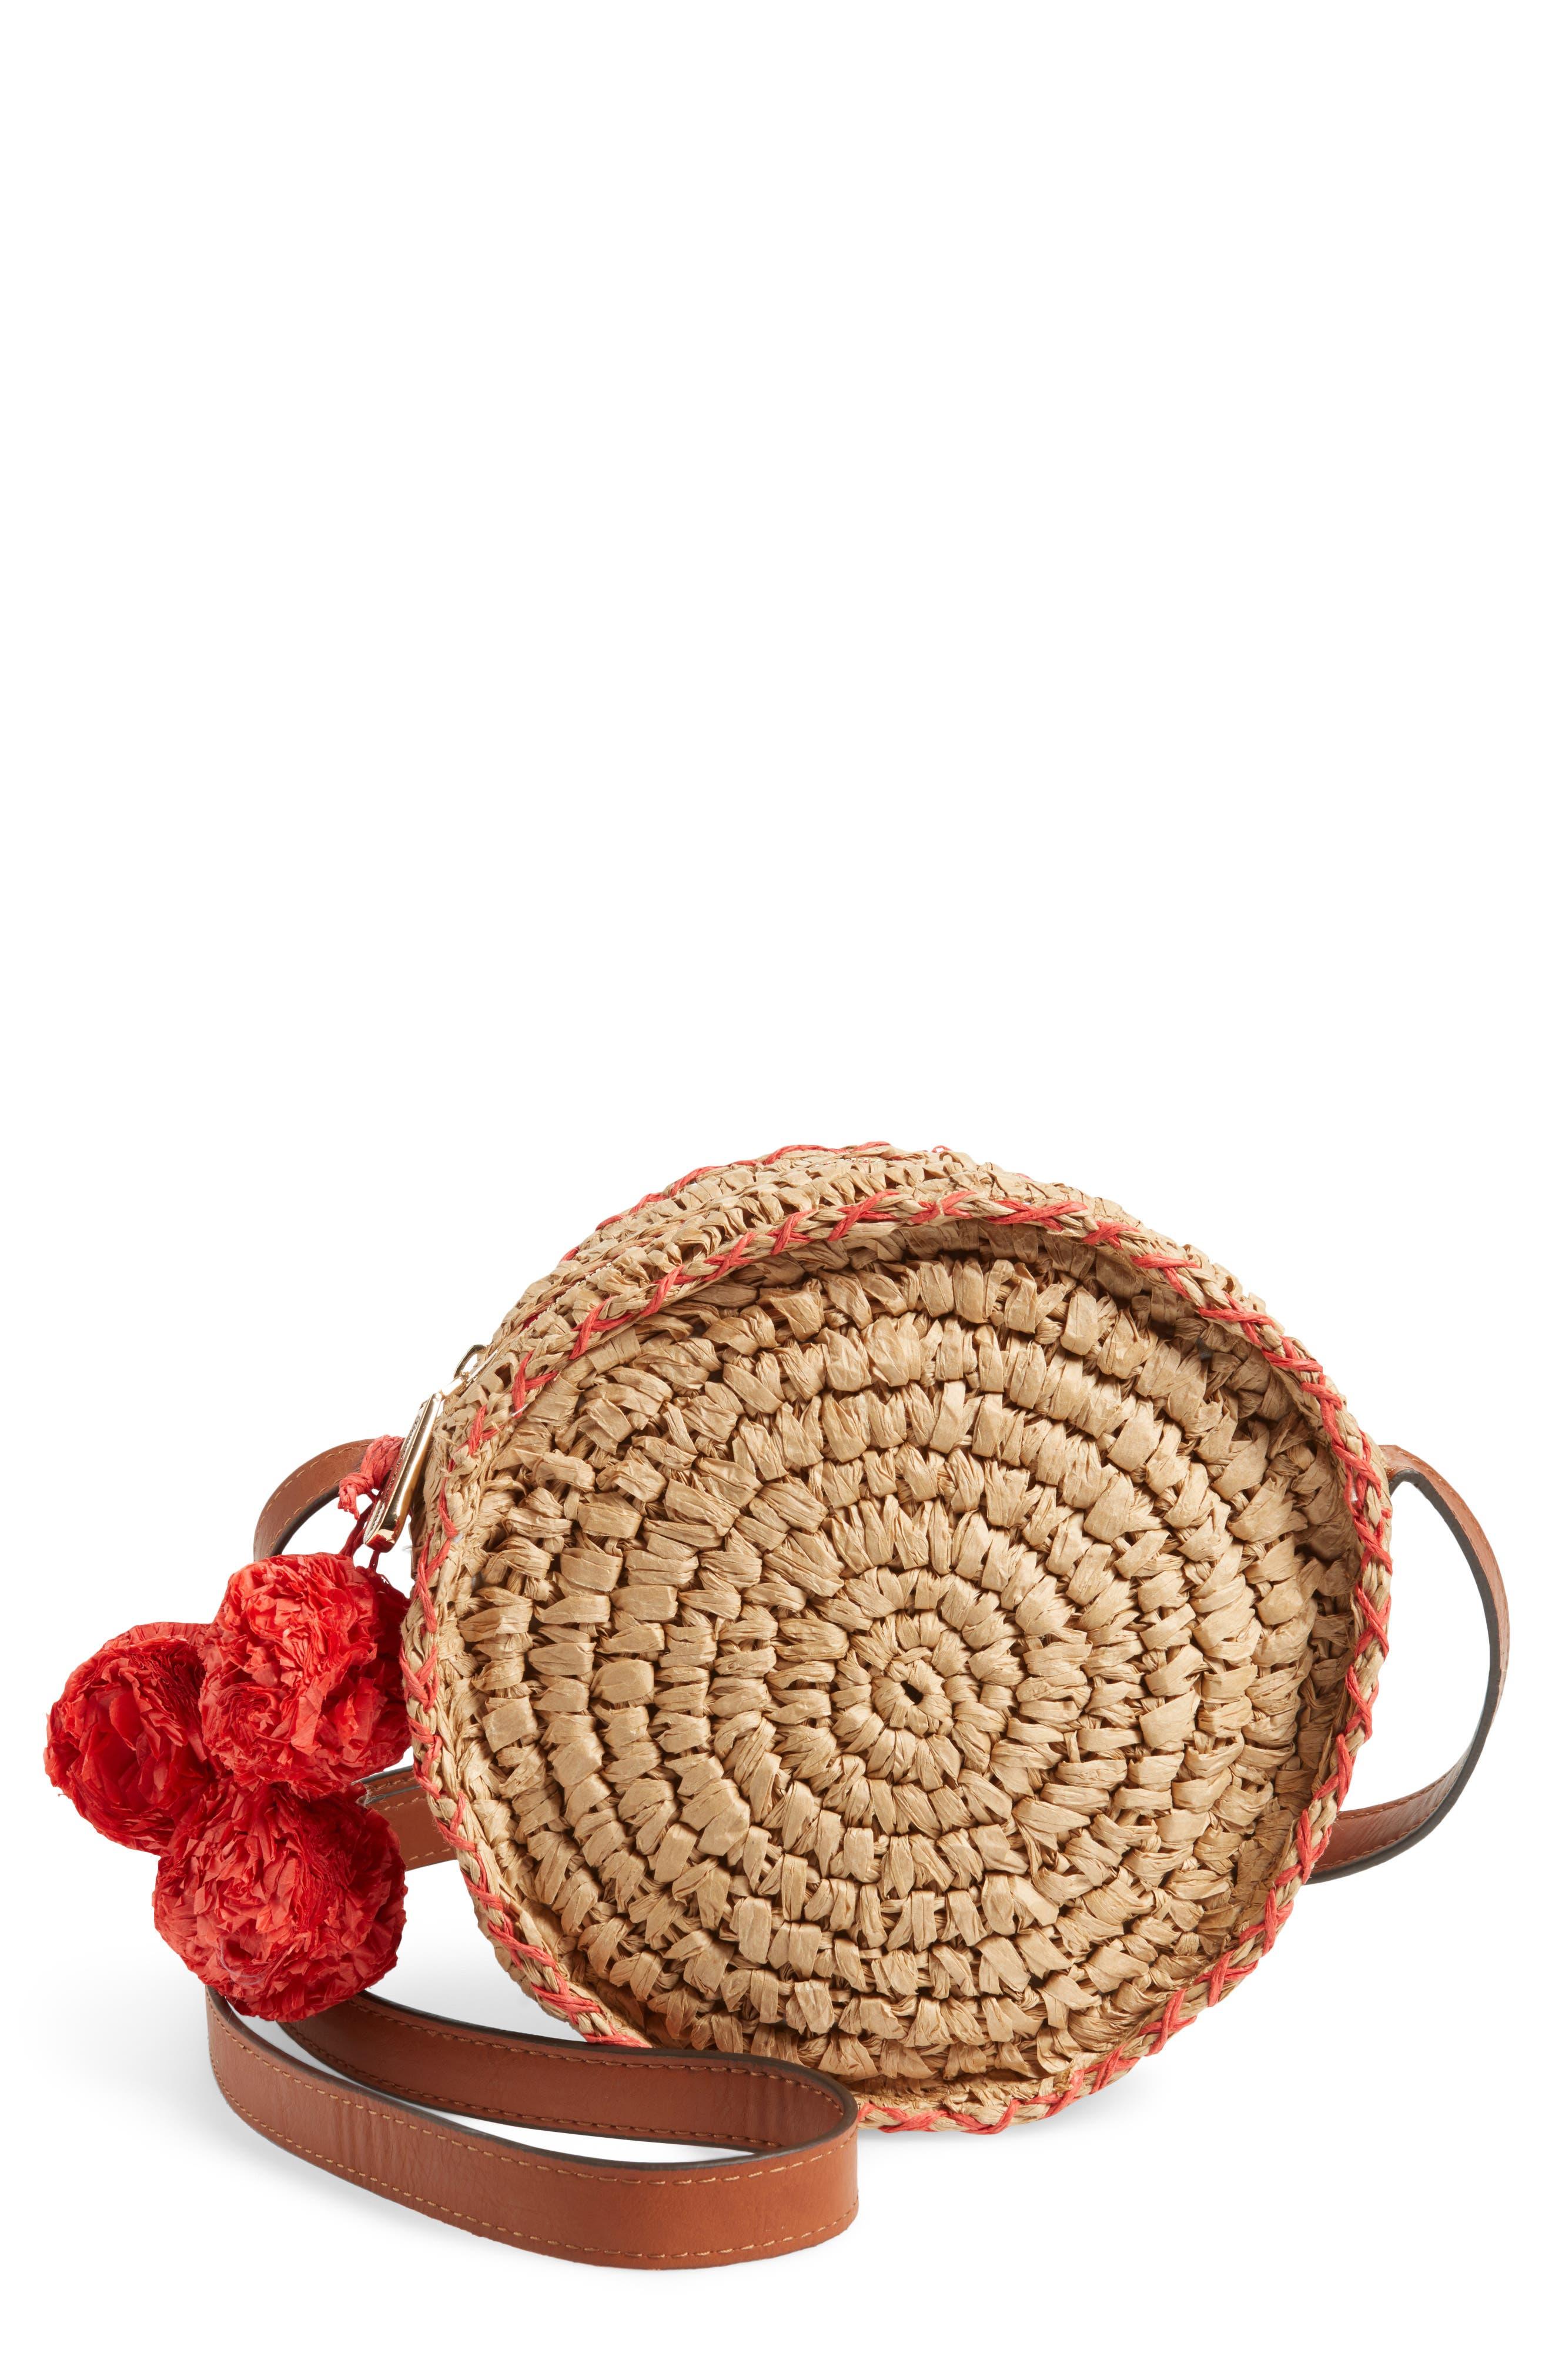 Tommy Bahama Pirro Woven Straw Crossbody Bag